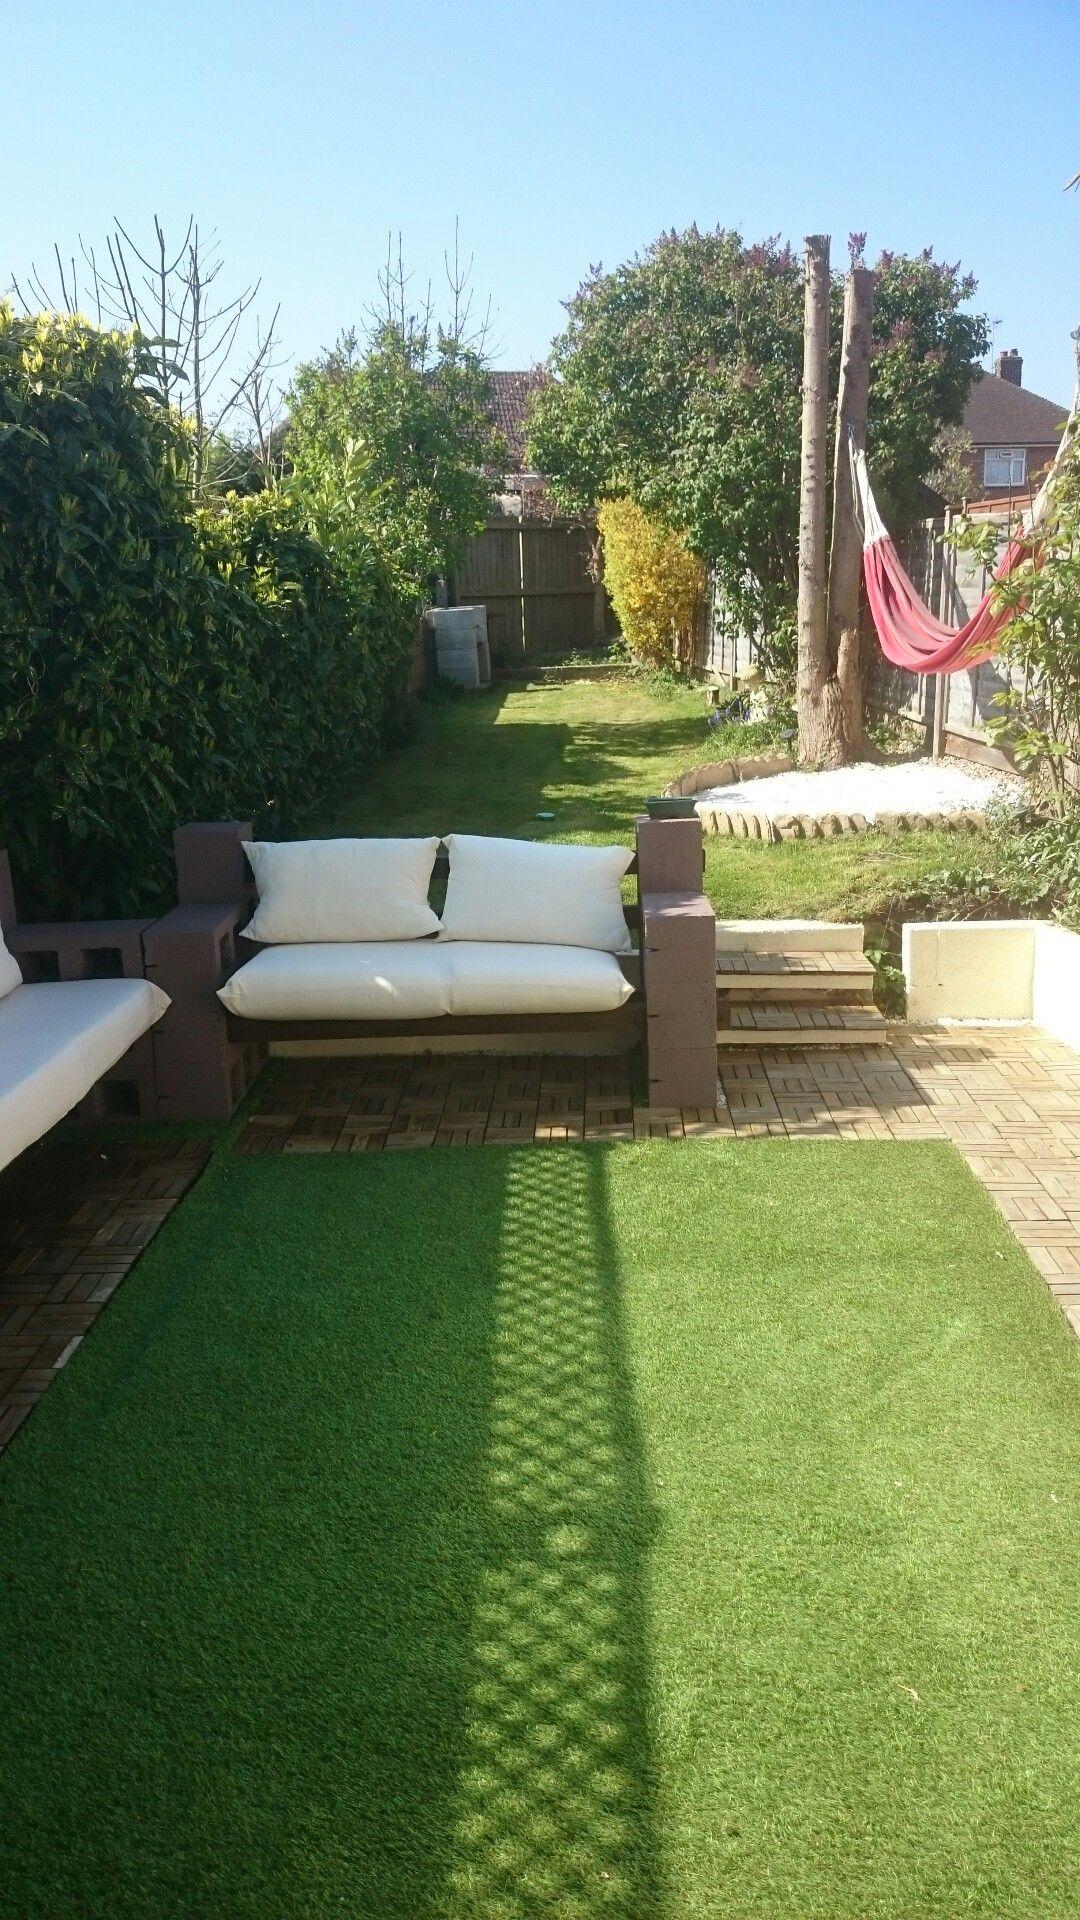 Concrete blocks benches diy cushions artificial grass